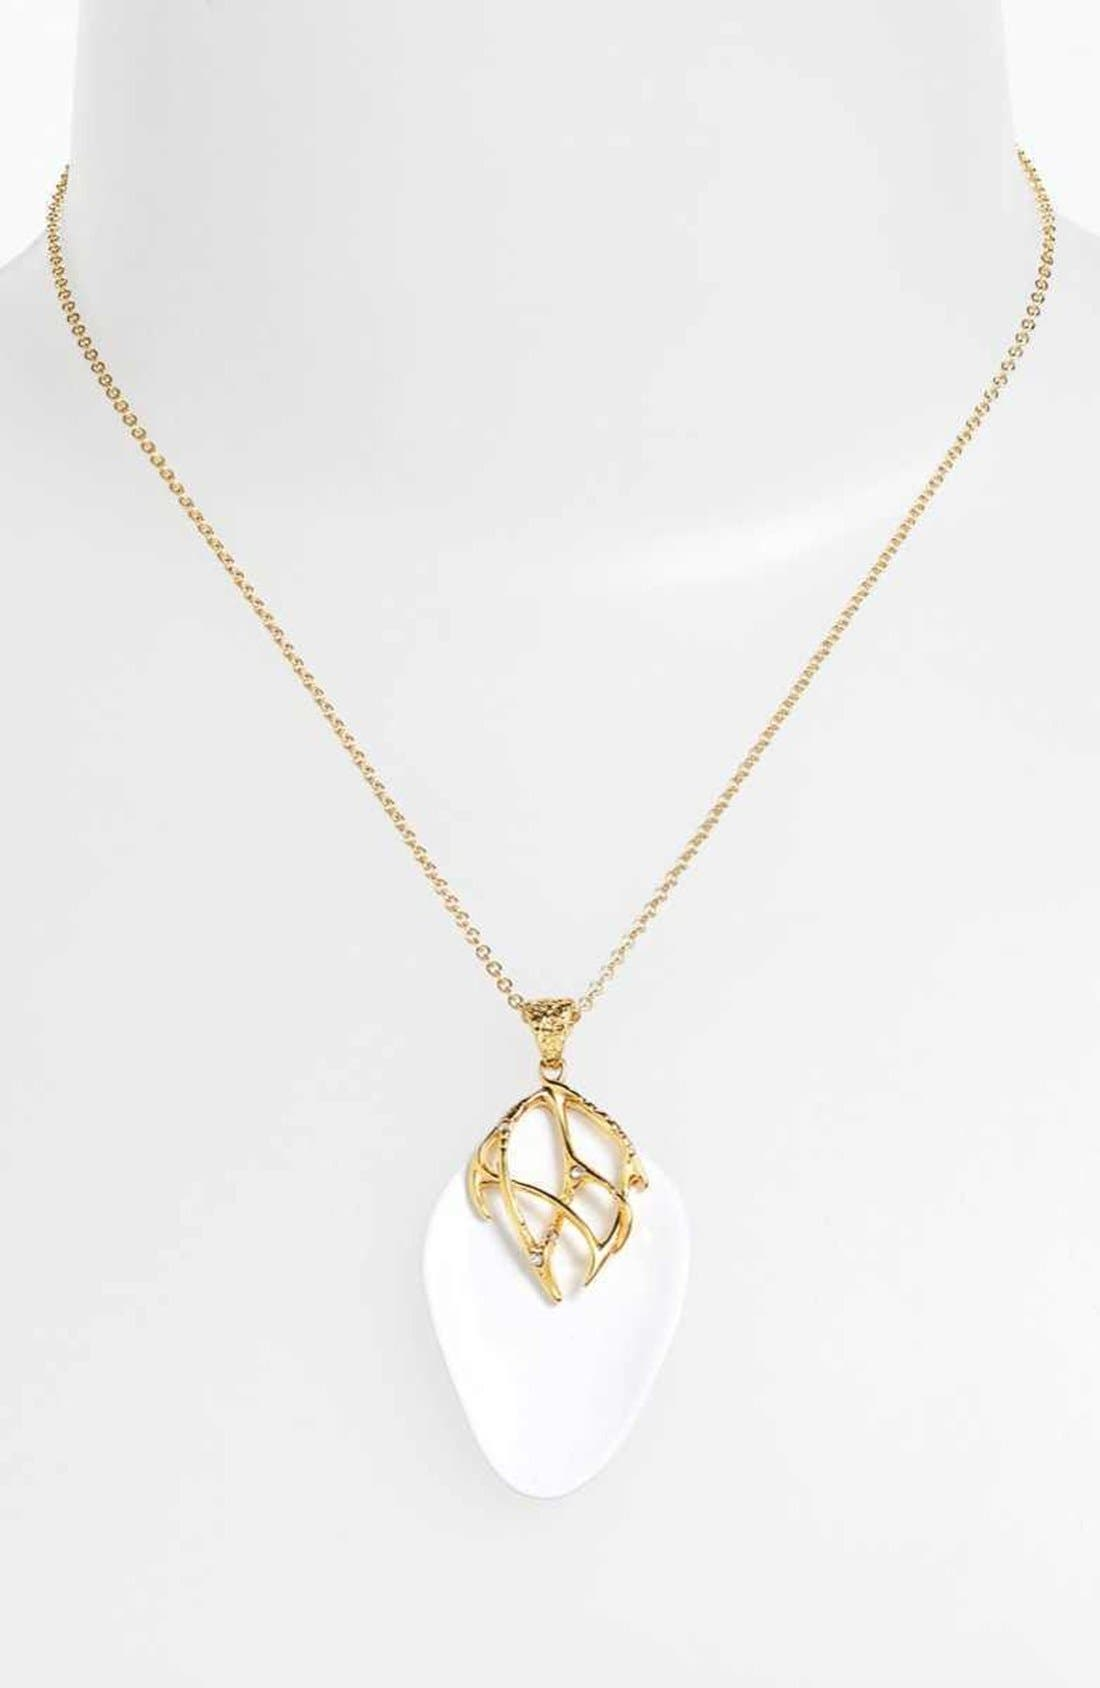 Alternate Image 1 Selected - Alexis Bittar 'Miss Havisham - Liquid Gold' Pendant Necklace